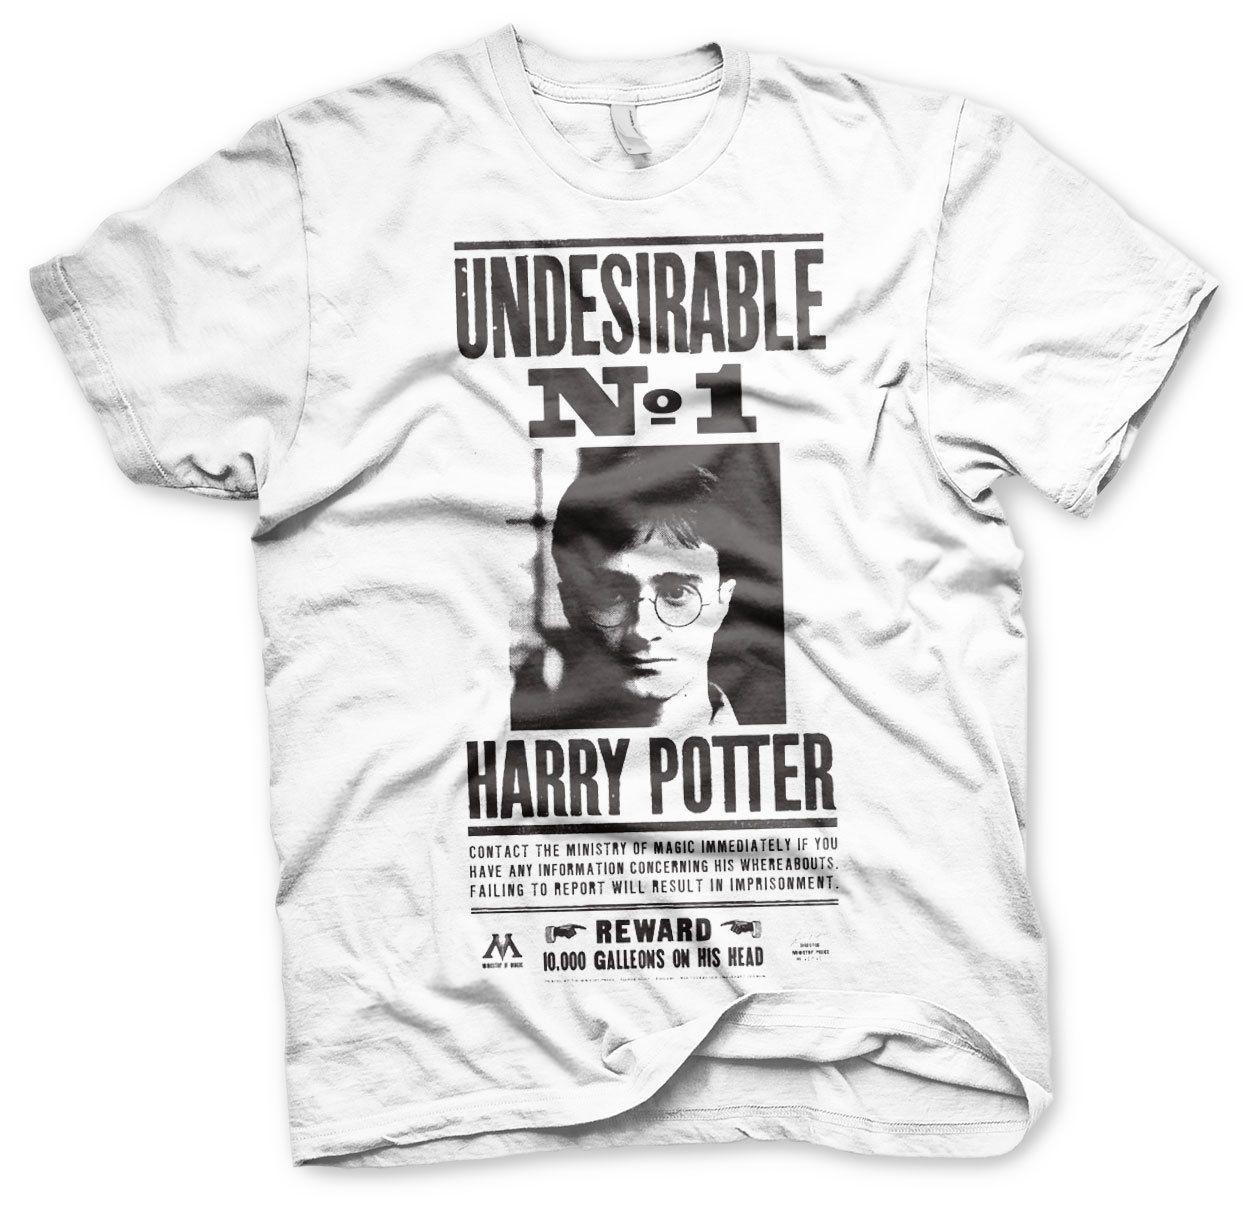 9c4de2155 Official Licensed Harry Potter Wanted Poster Men's T-Shirt S-XXL Sizes  (White)